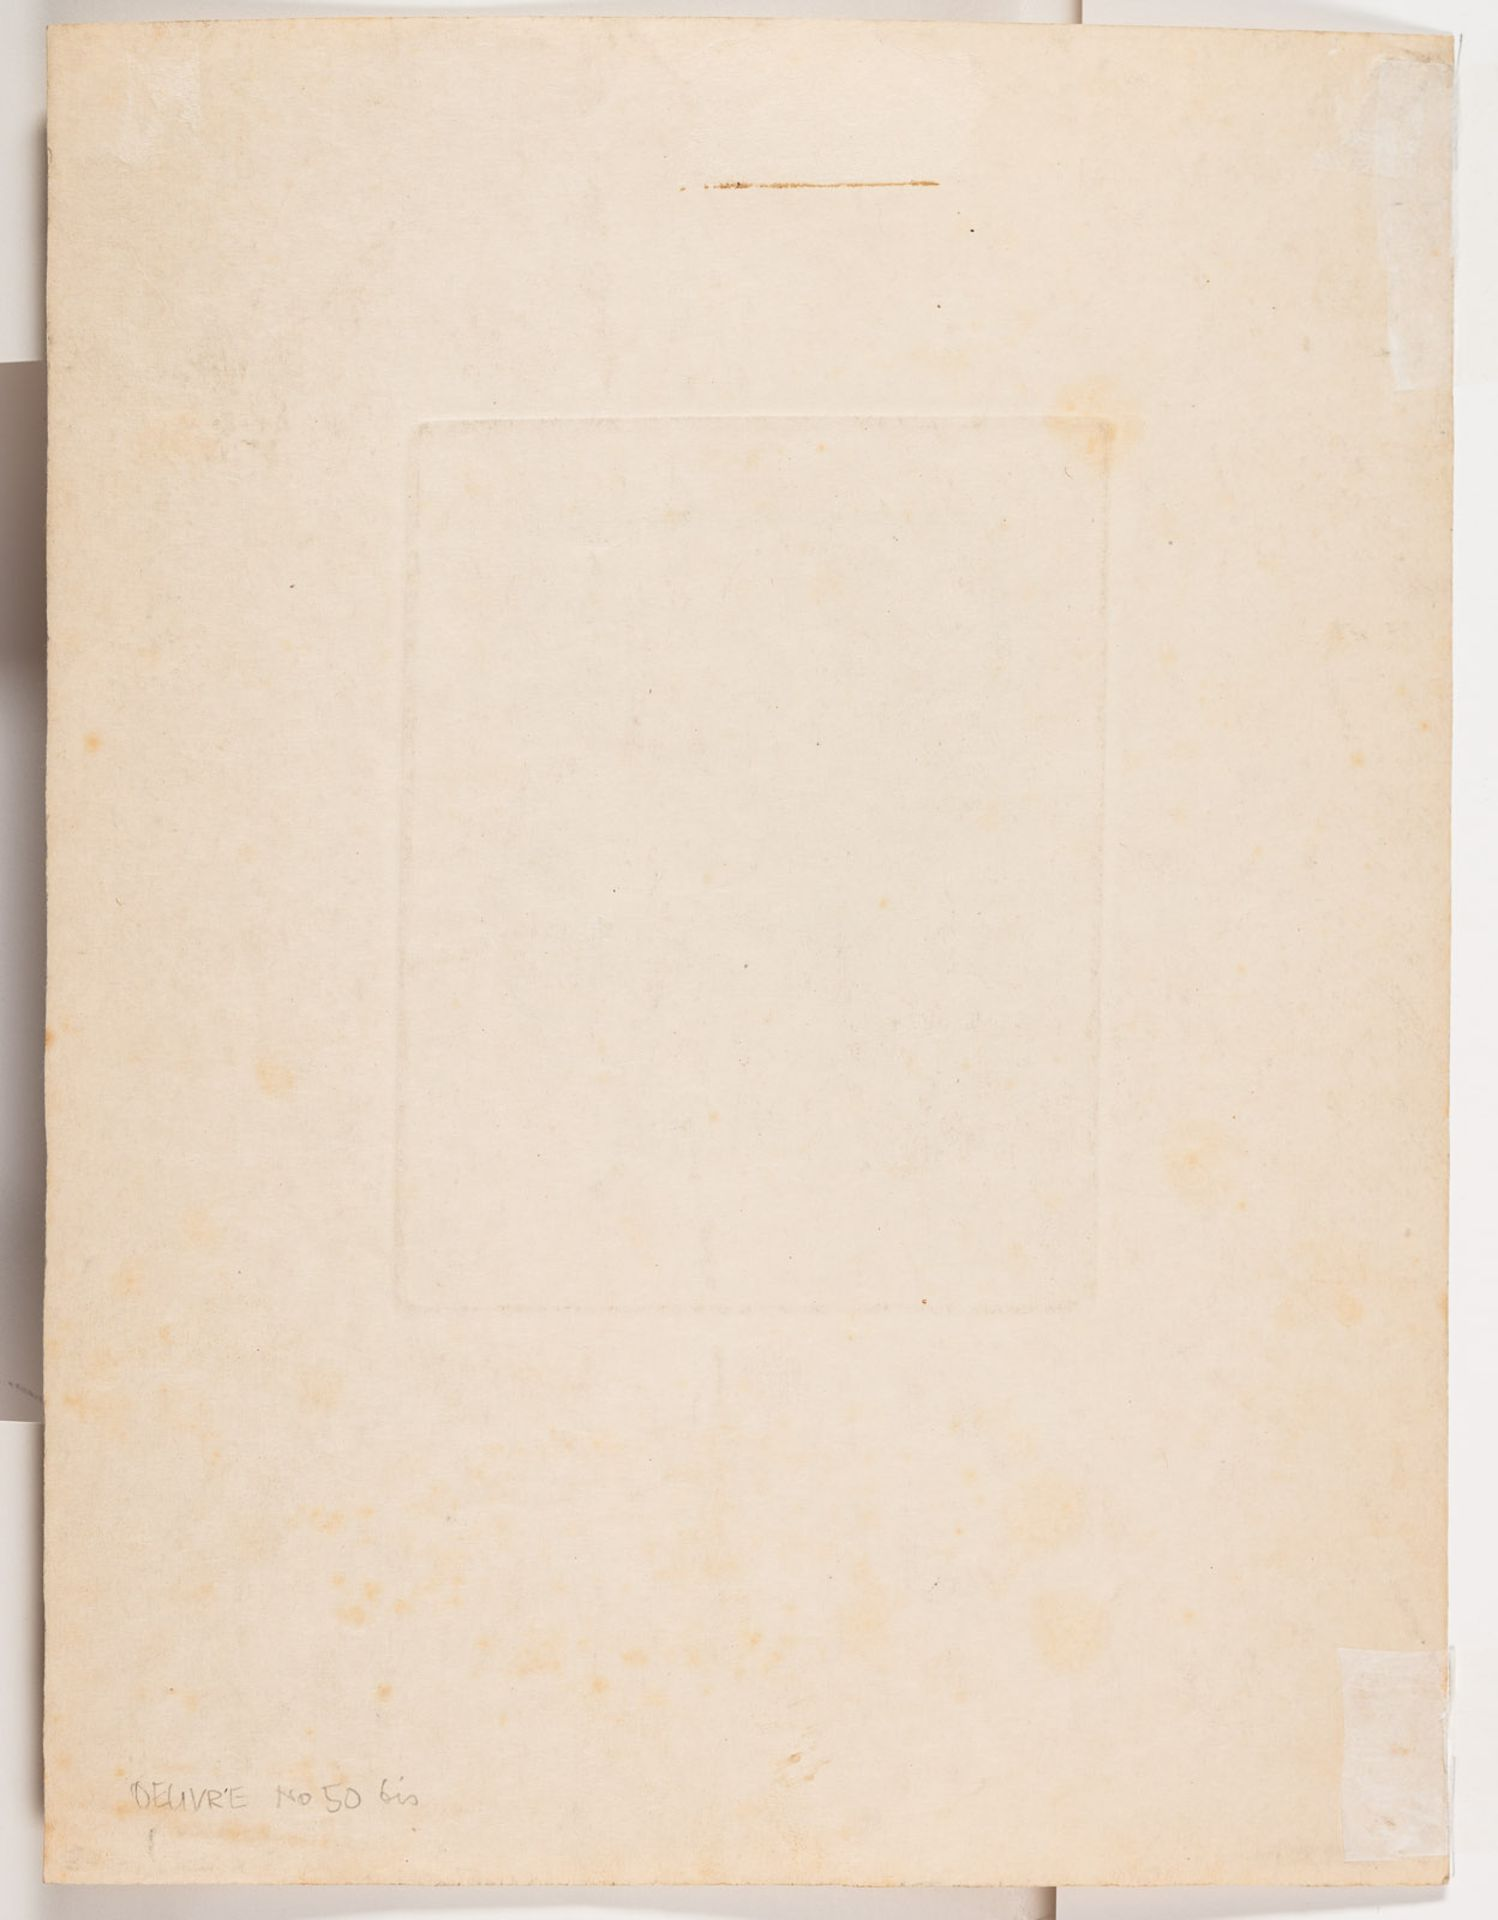 Khnopff, Fernand - Image 3 of 3